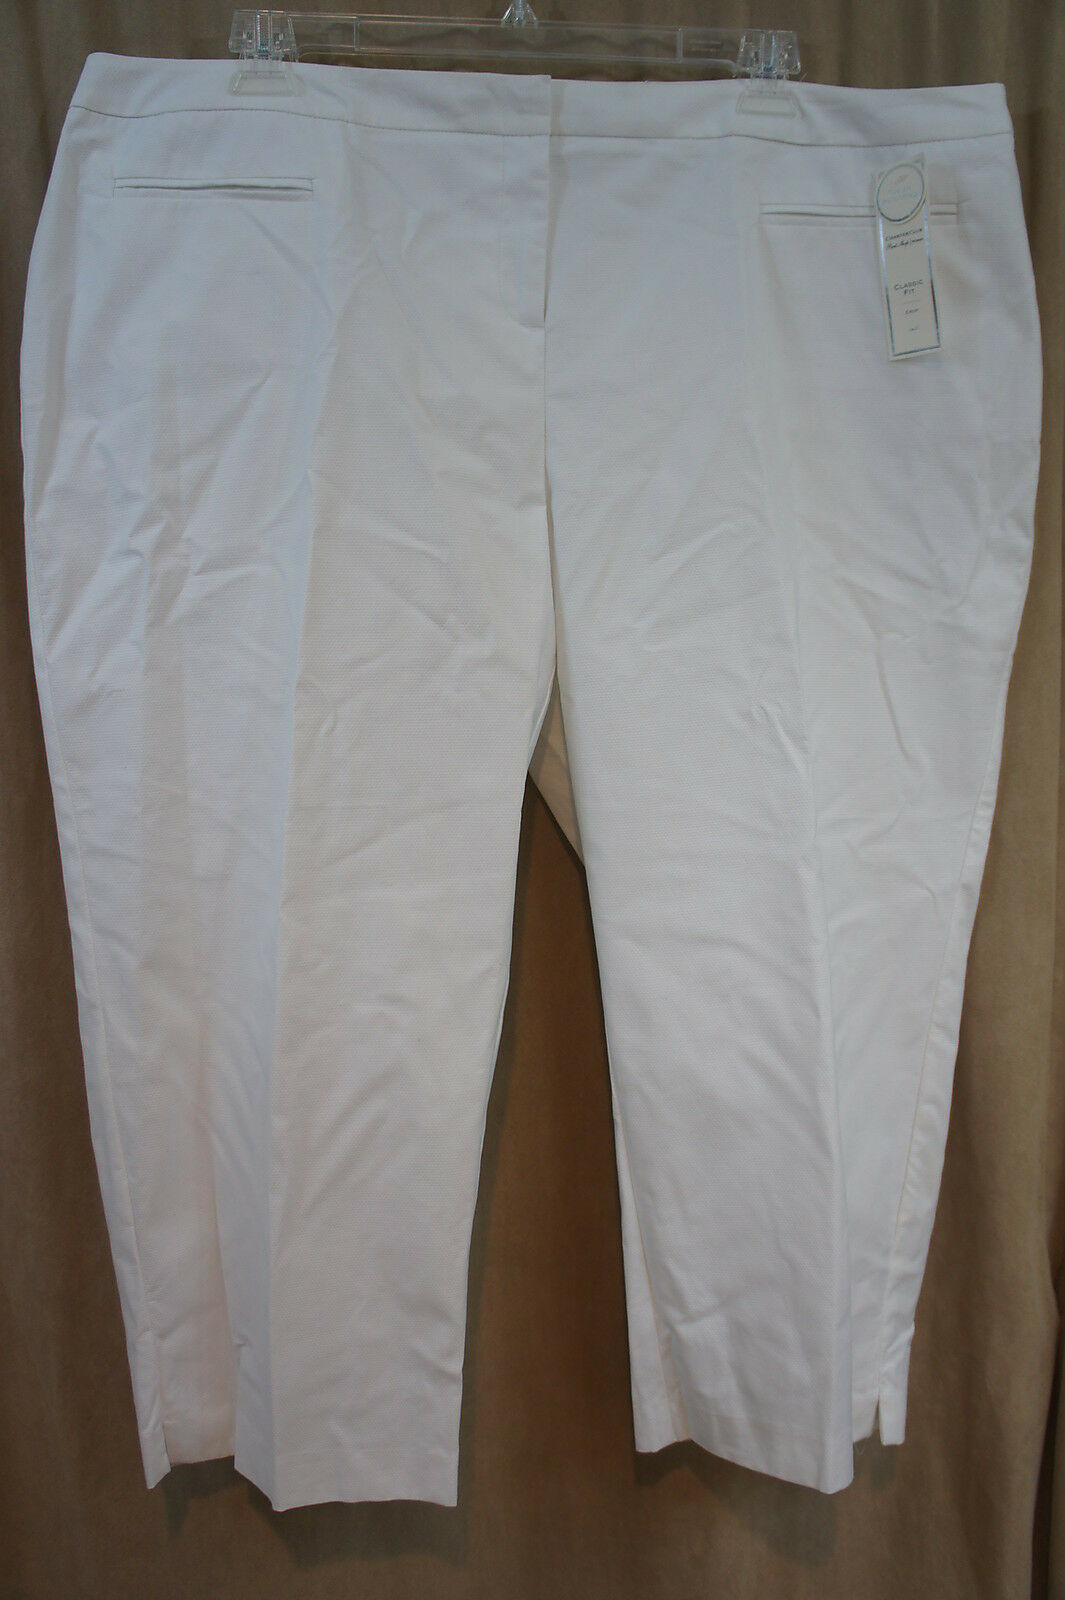 Charter Club Pant Shop Woman Cropped Pants Sz 22W White Classic Fit Slimming